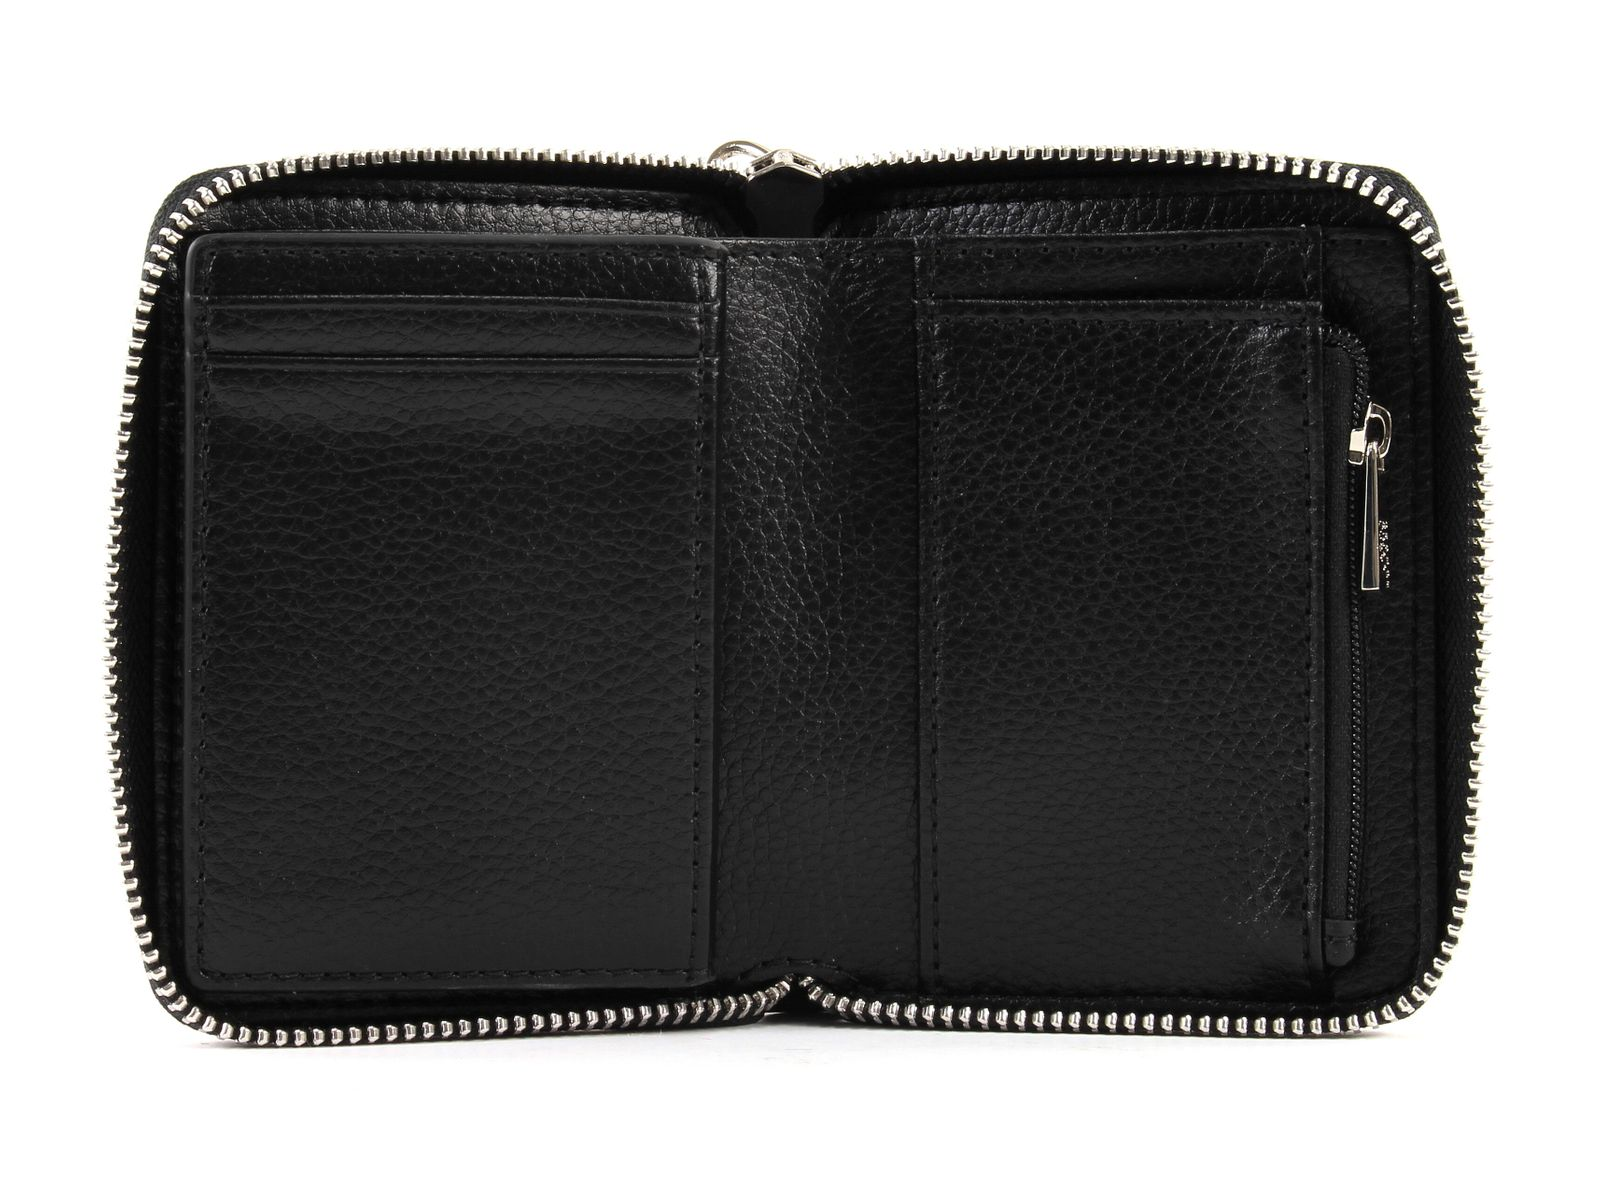 george gina lucy purse let her wallet. Black Bedroom Furniture Sets. Home Design Ideas